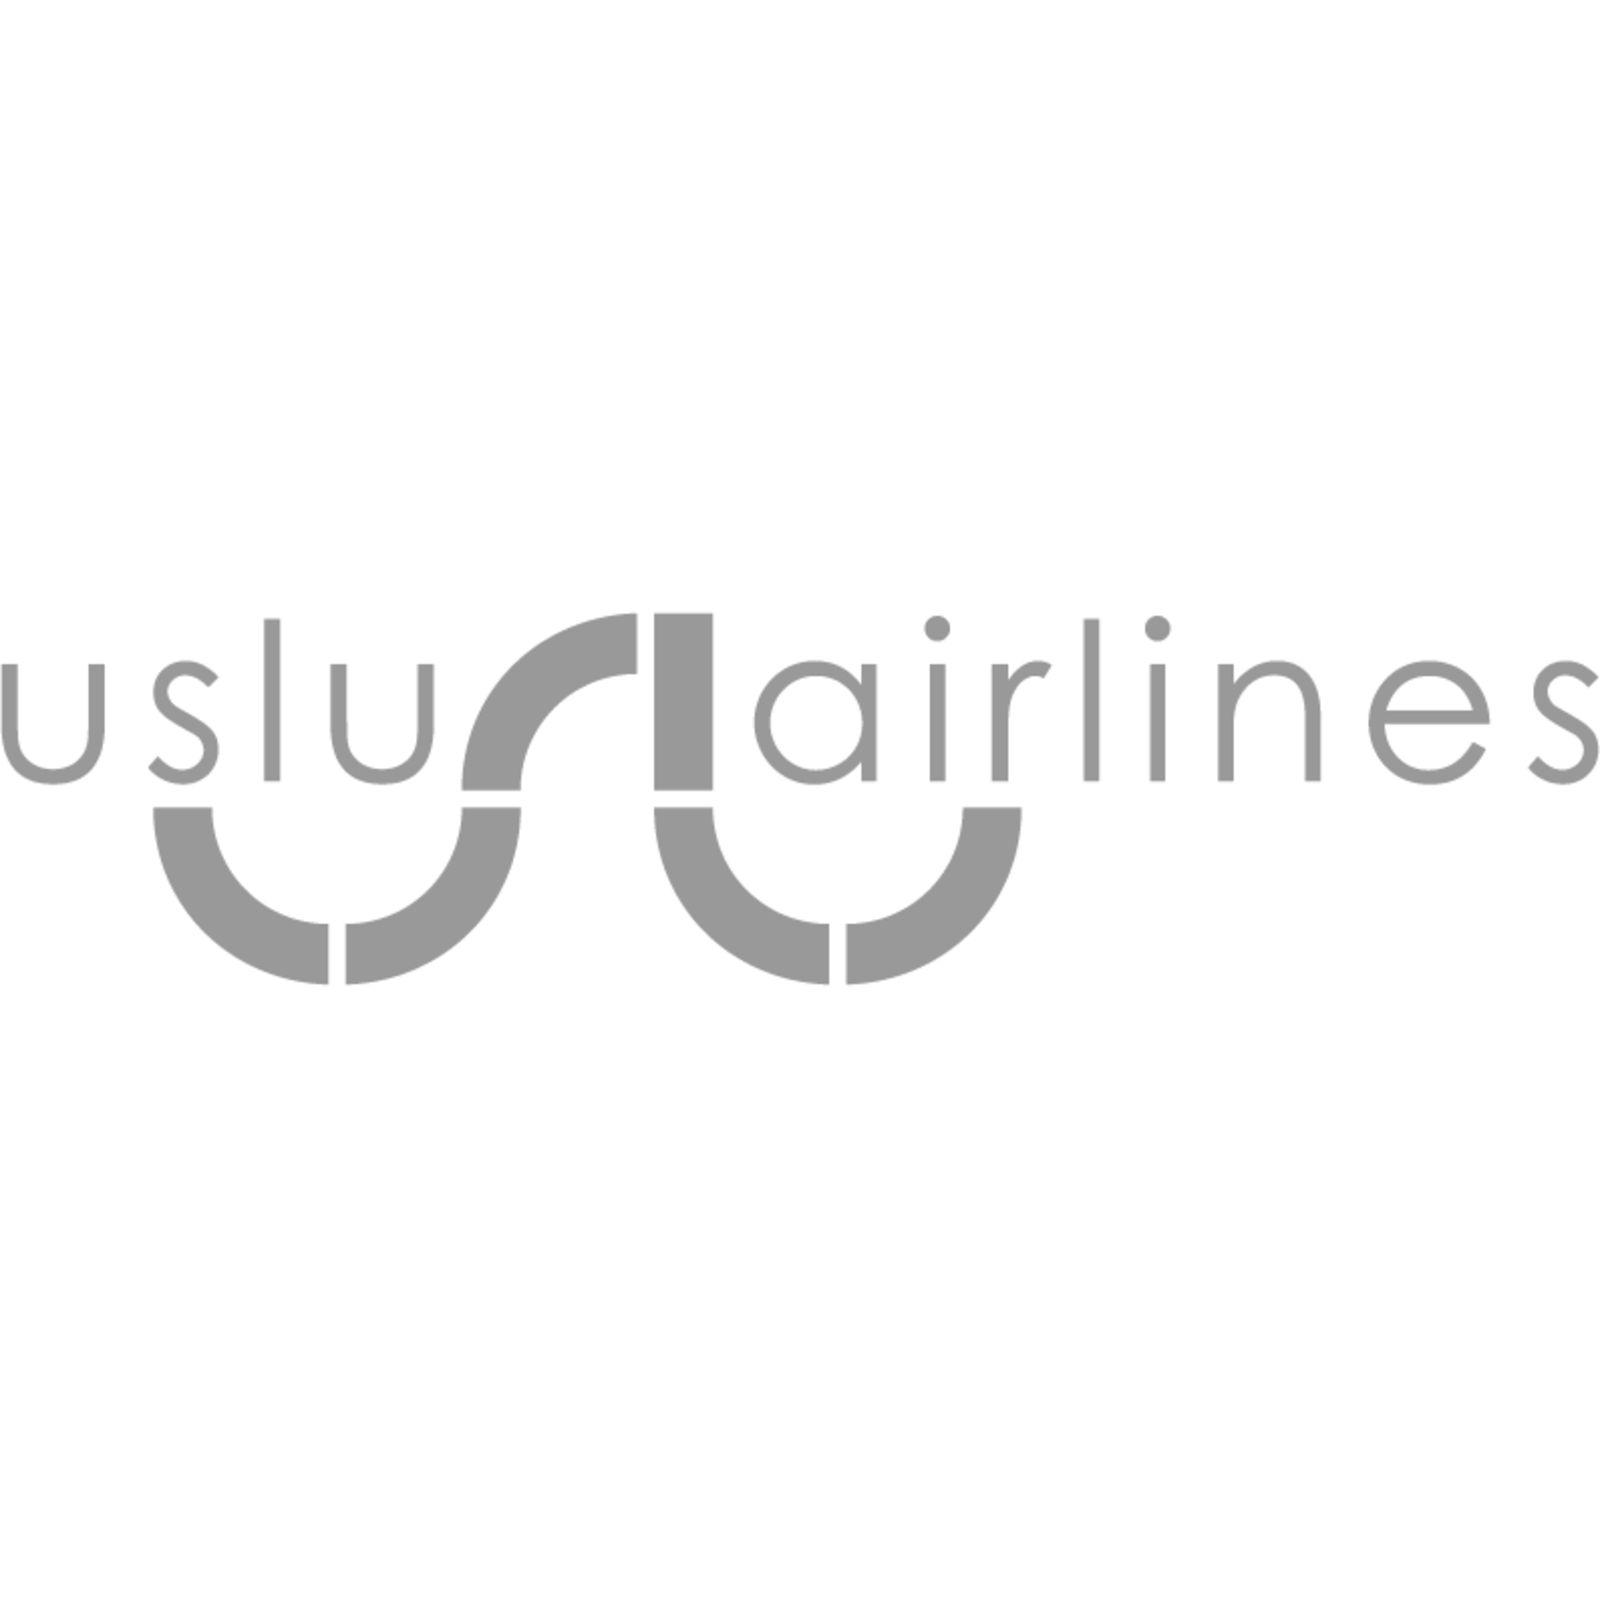 uslu airlines (Bild 1)